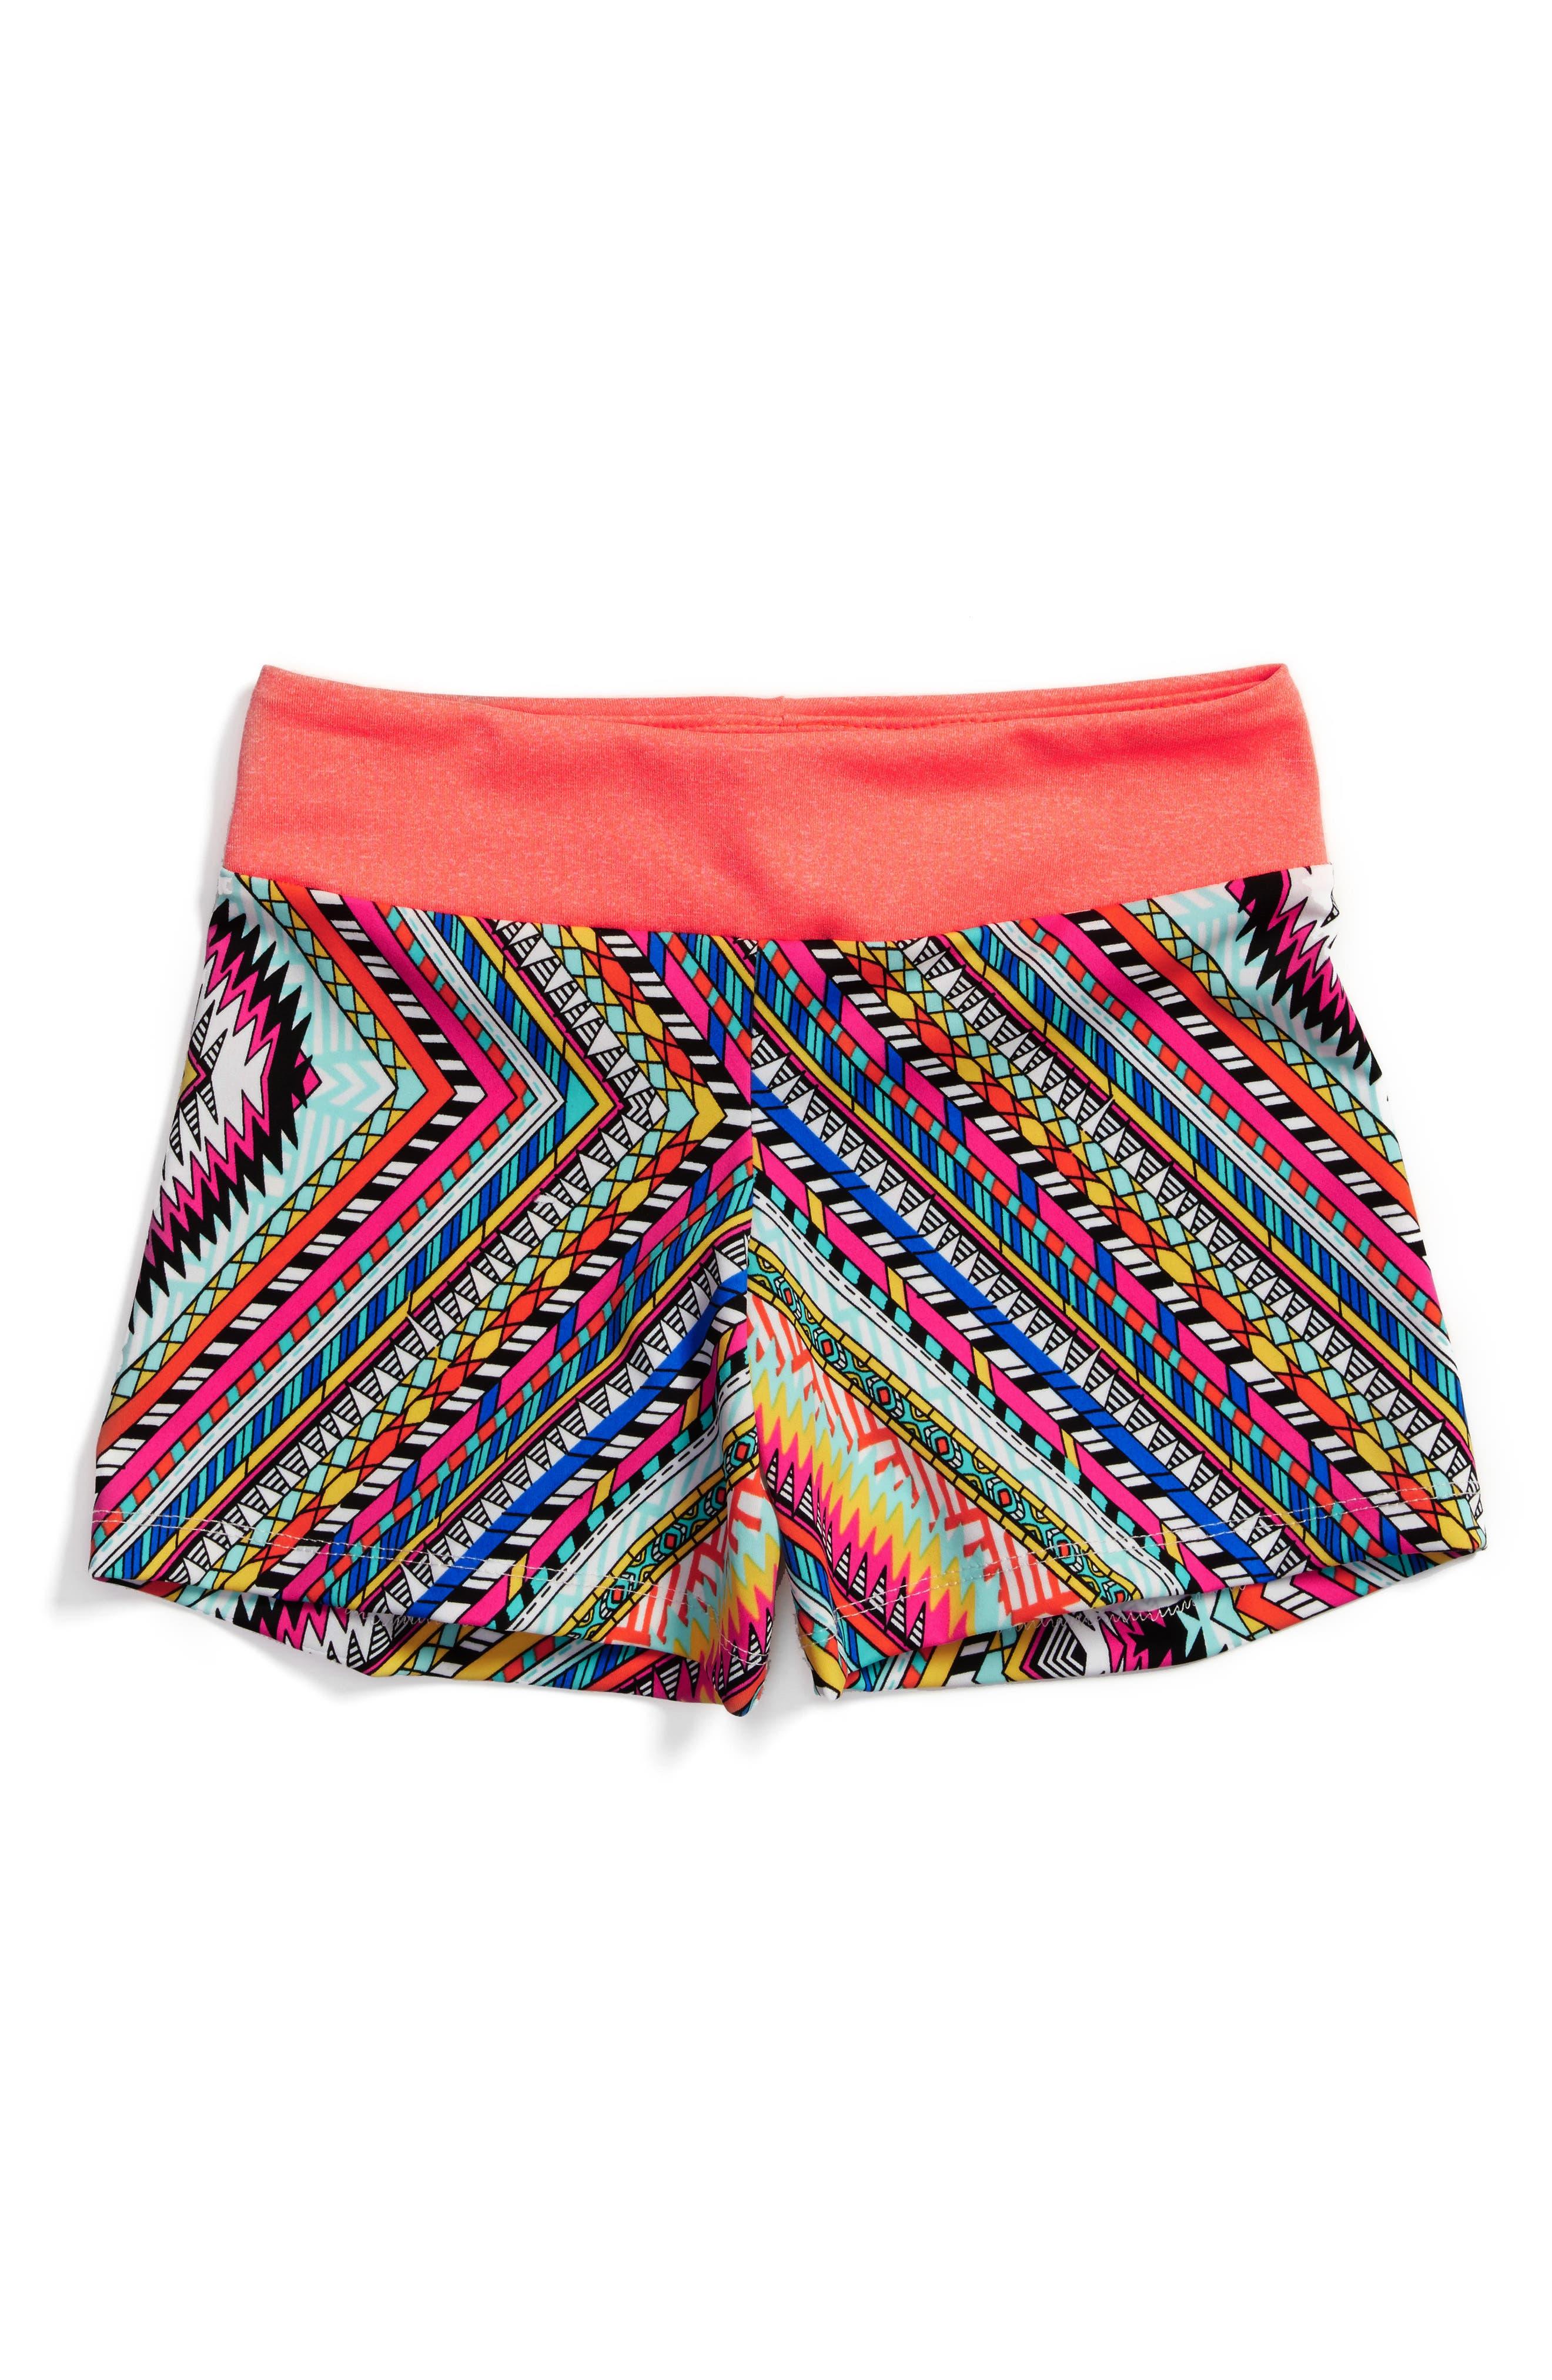 Zigzag Stretch Shorts,                         Main,                         color, Coral Multi